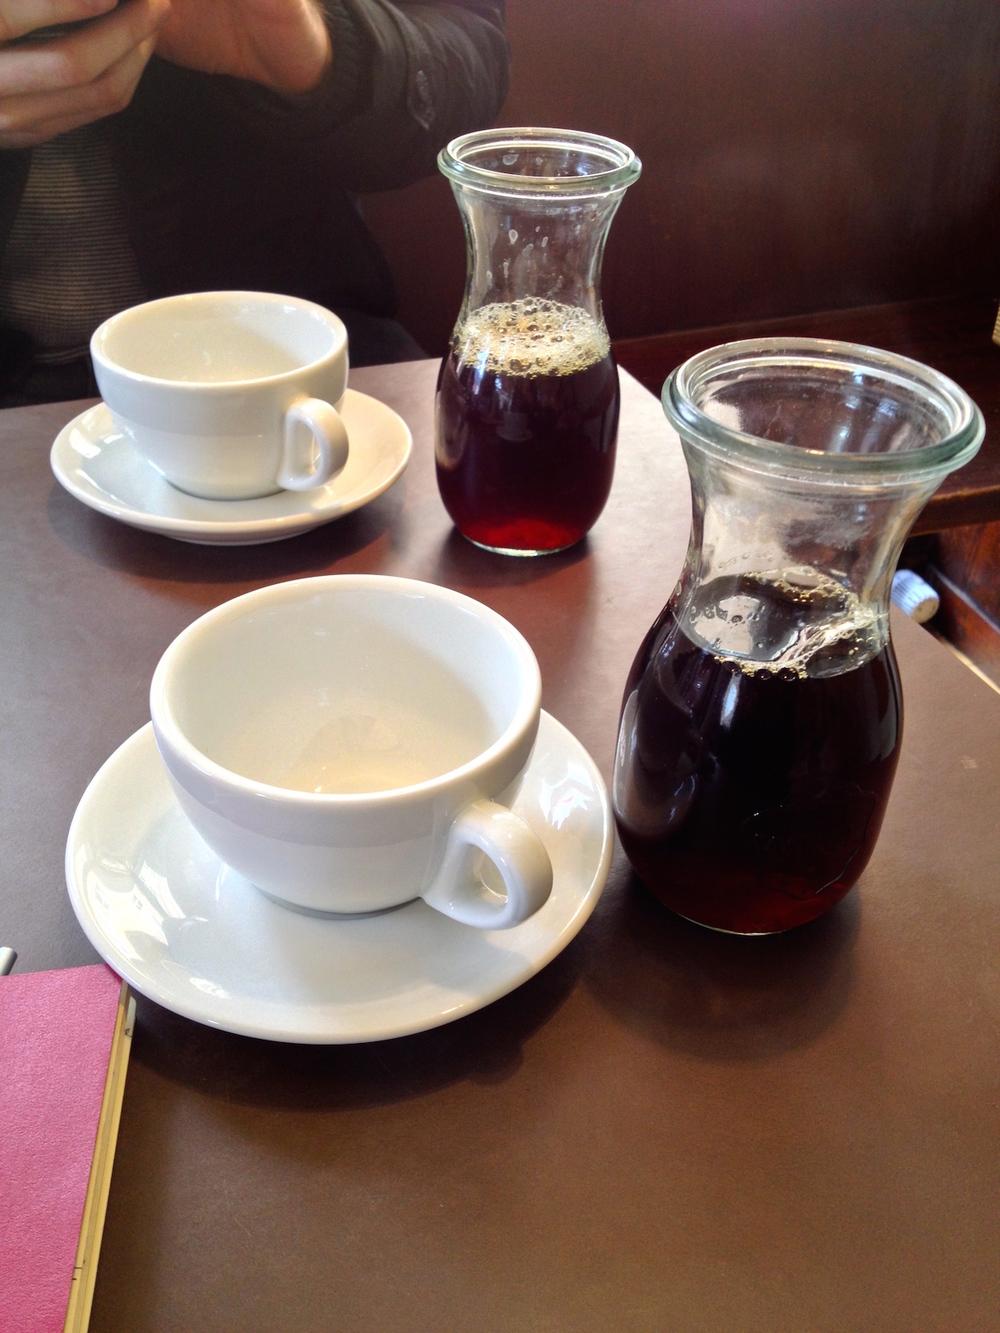 Woyton drip brew coffee